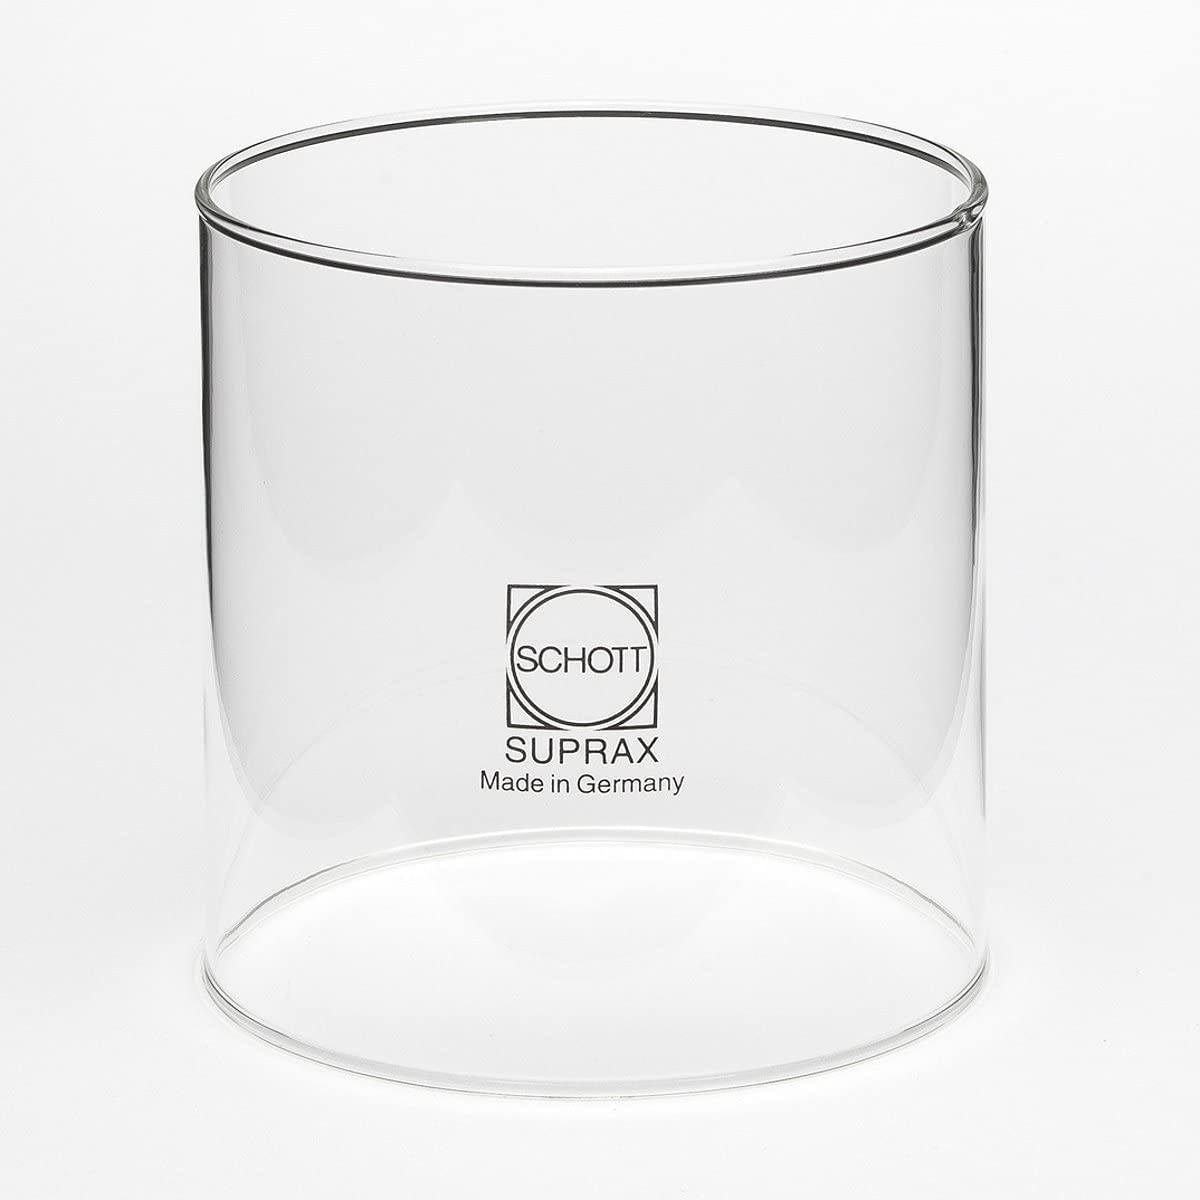 Vidrio de repuesto para Petromax hk 350 hk 500-vidrio claro